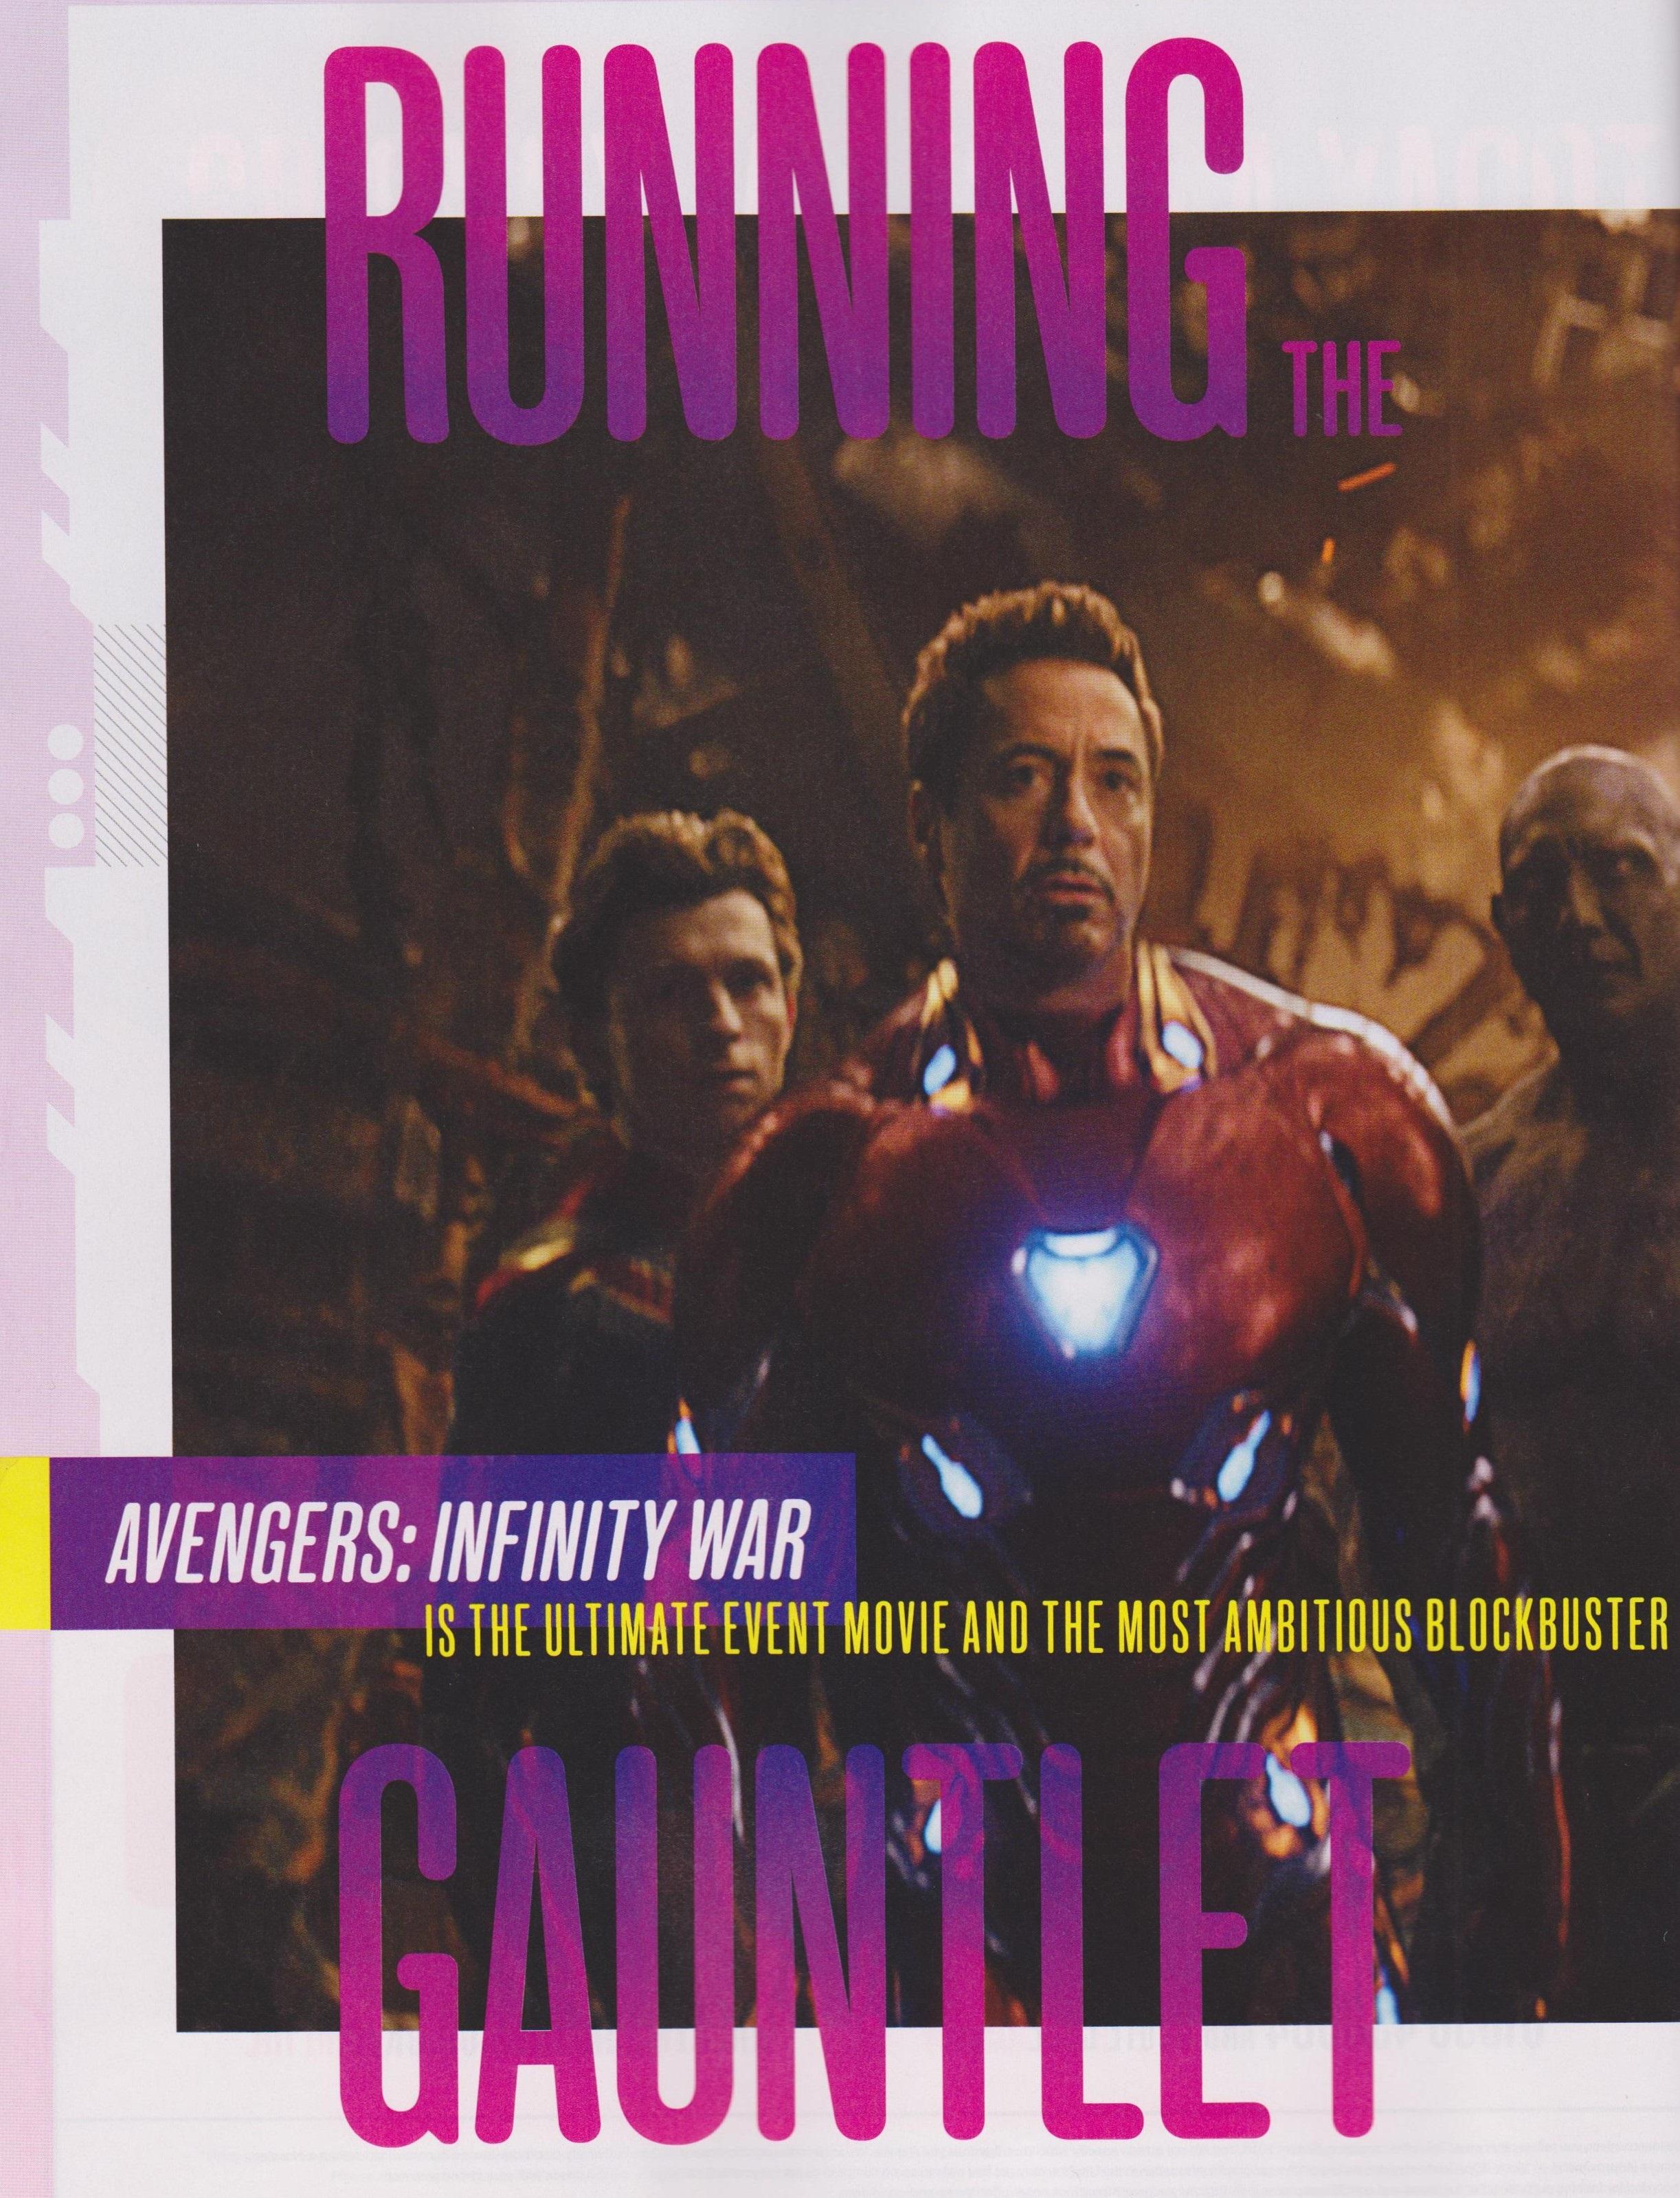 Spider-Man, Iron Man and Drax